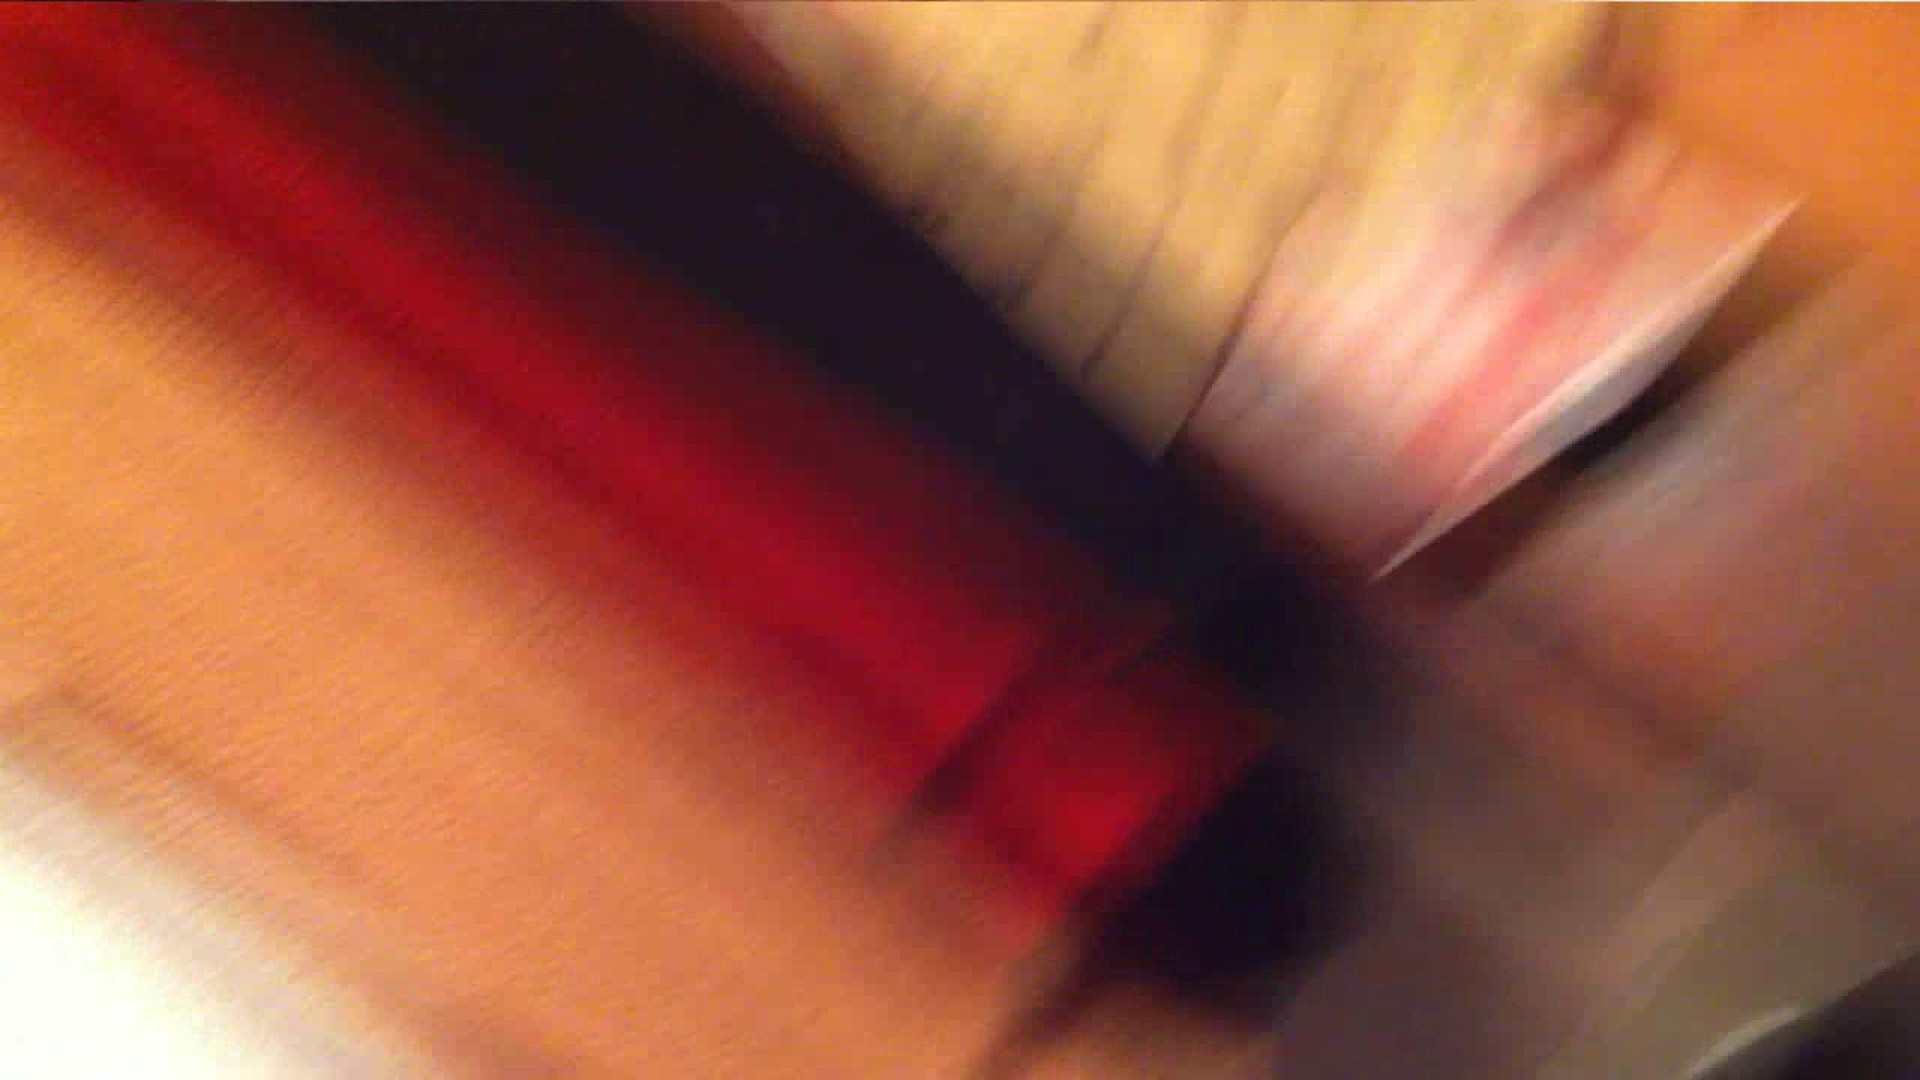 vol.35 美人アパレル胸チラ&パンチラ ひらひらスカートの中身は? 胸チラ 覗きスケベ動画紹介 56PICs 4